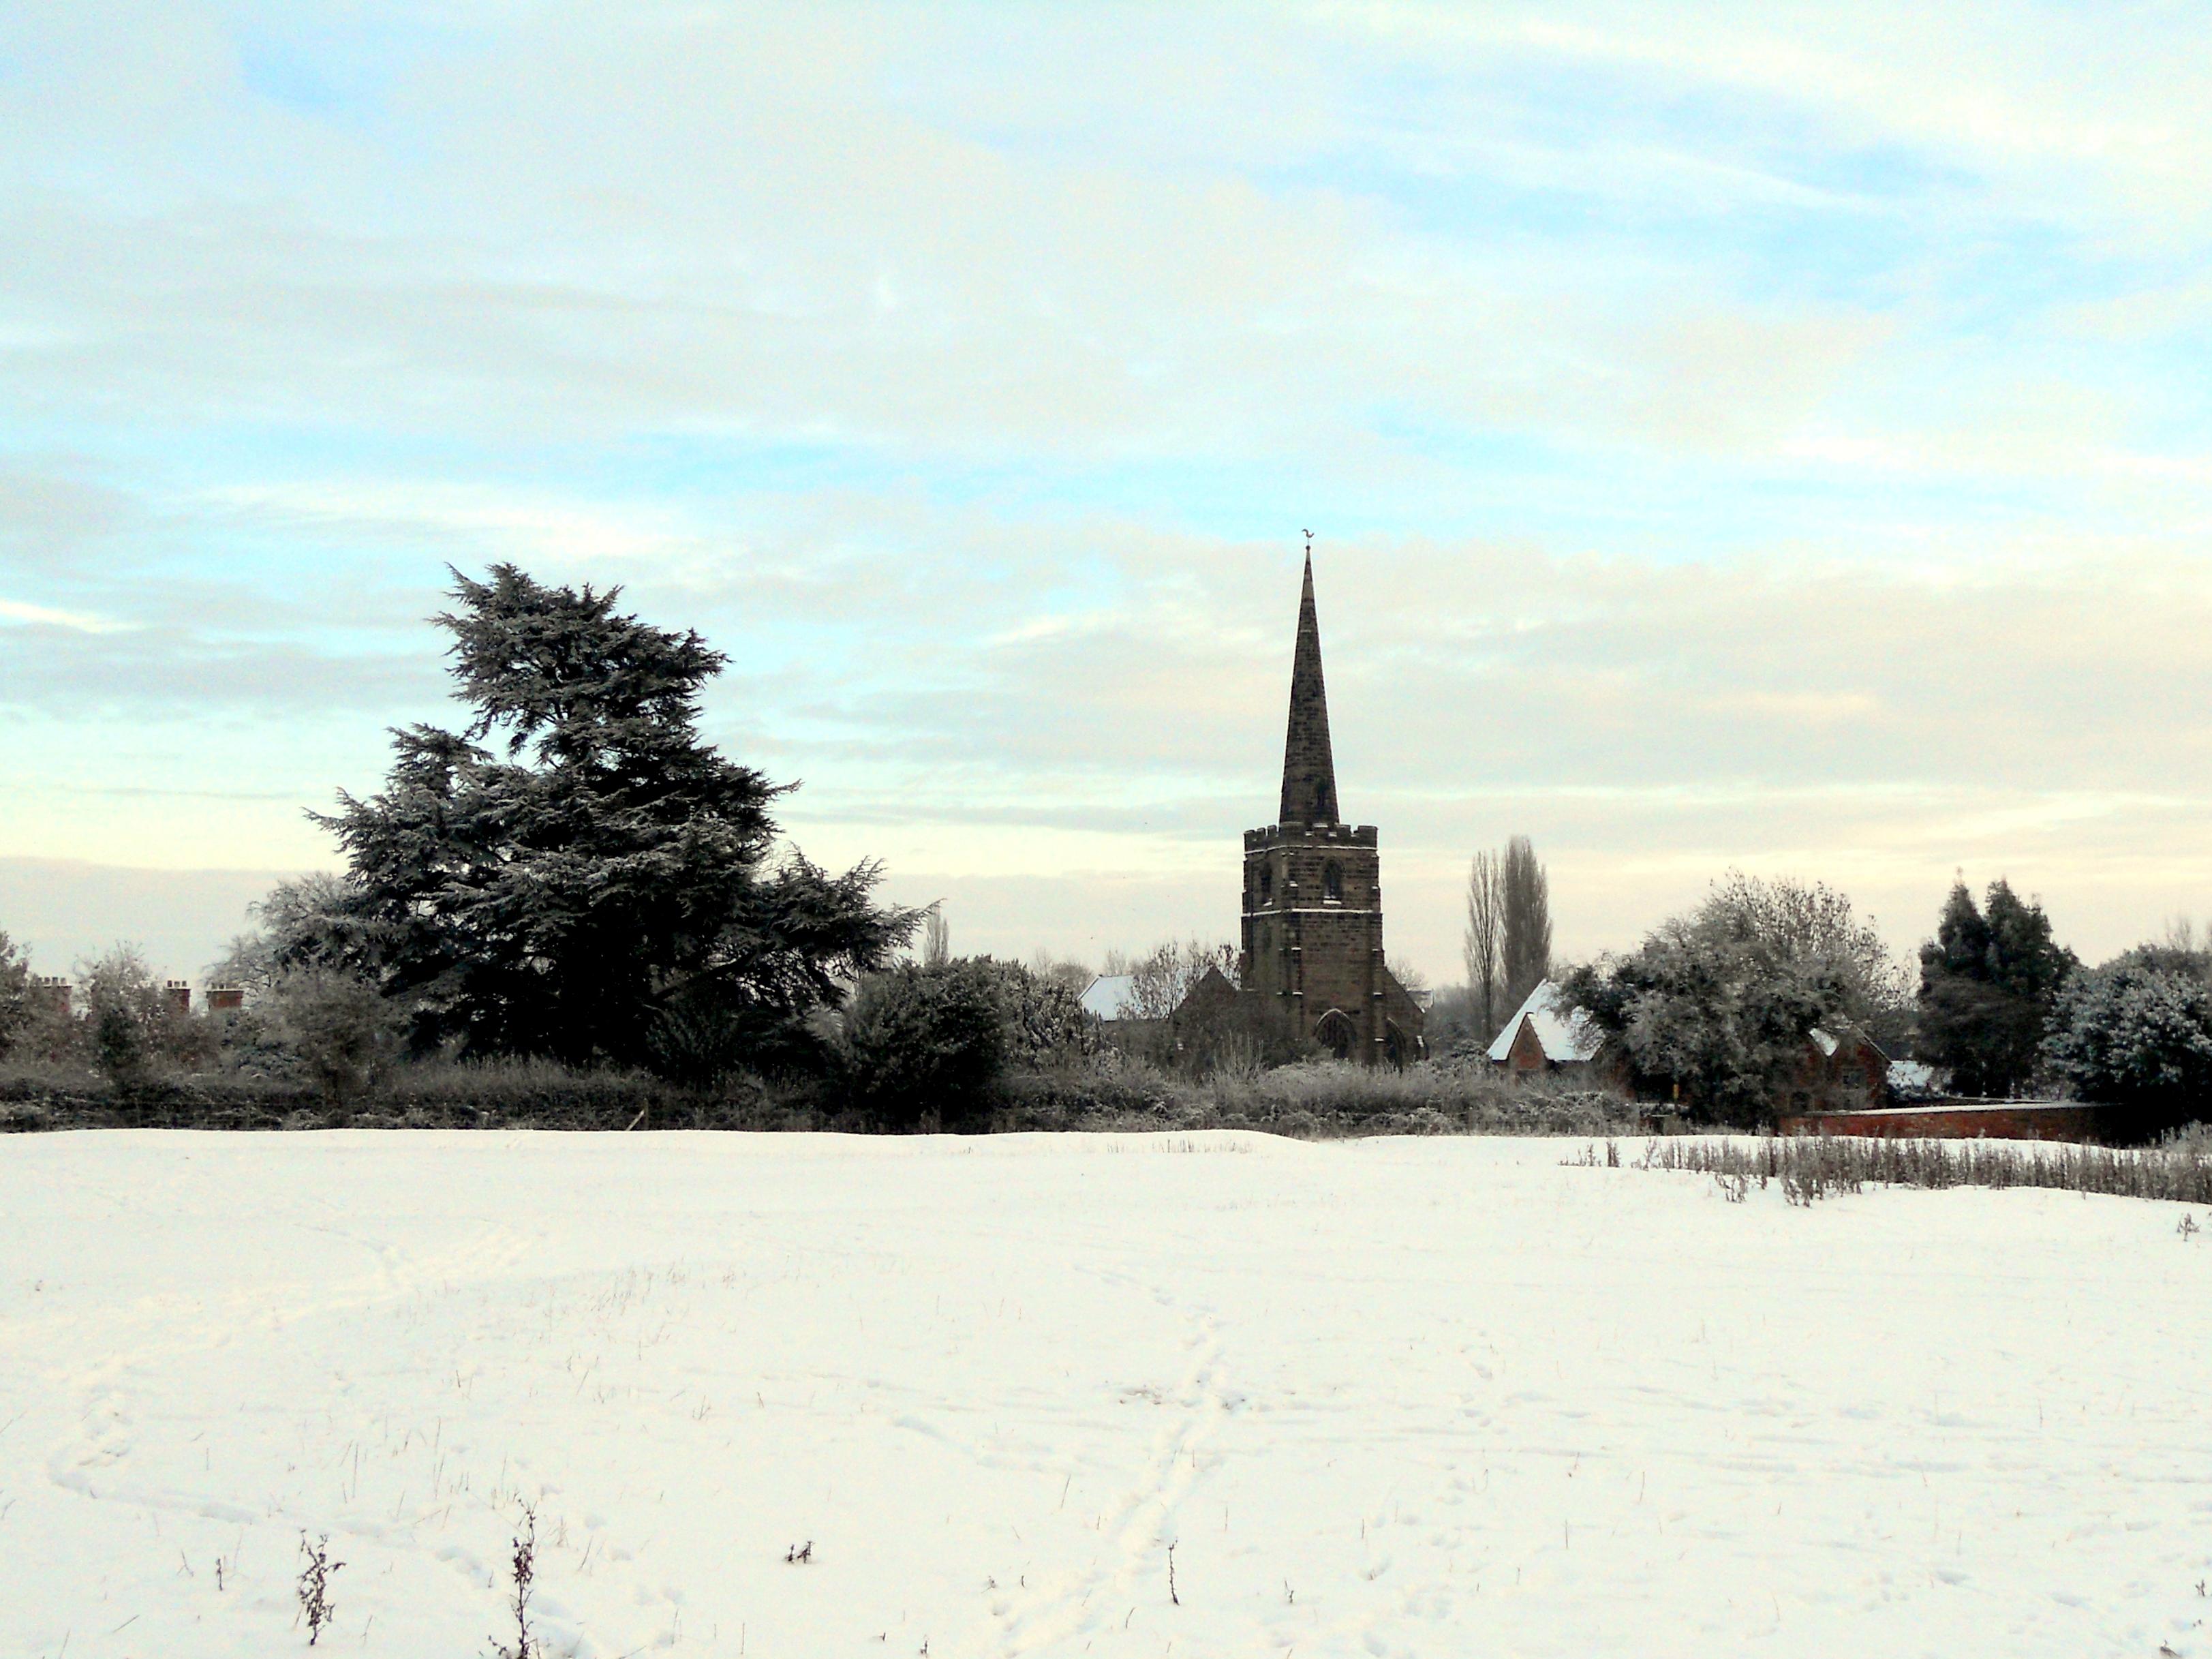 GENUKI: Orton on the Hill, Leicestershire